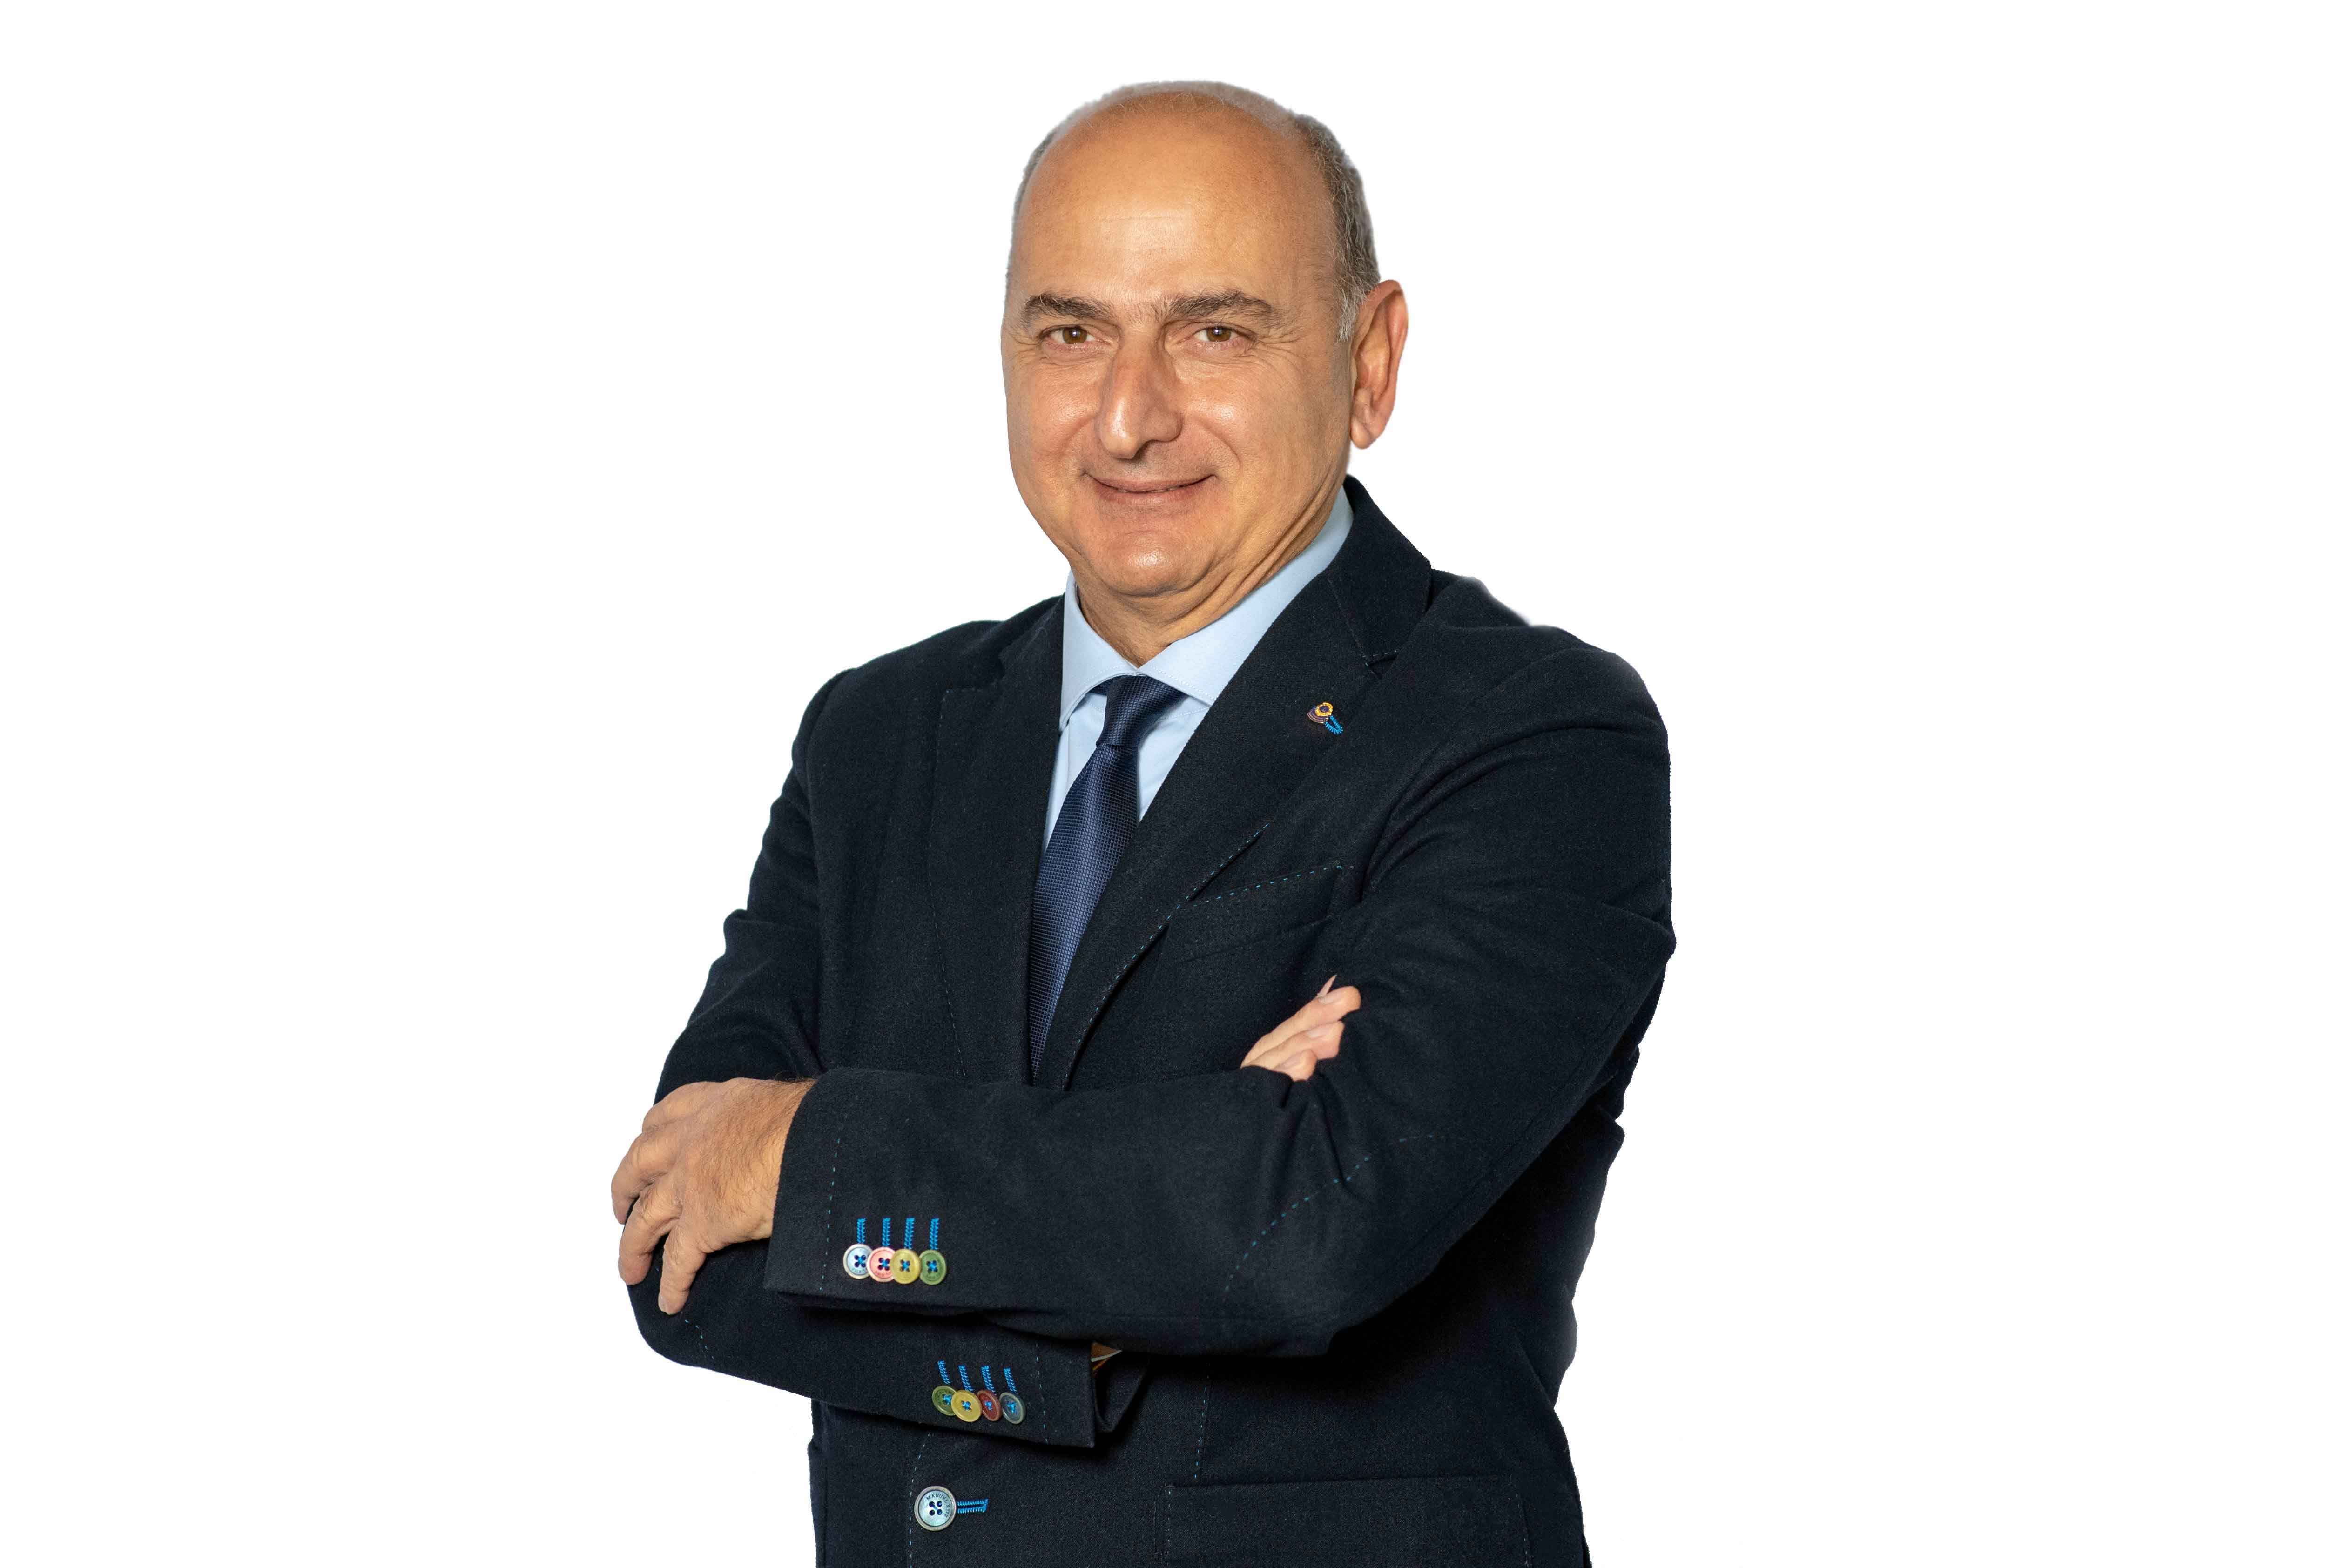 Mauro Andretta